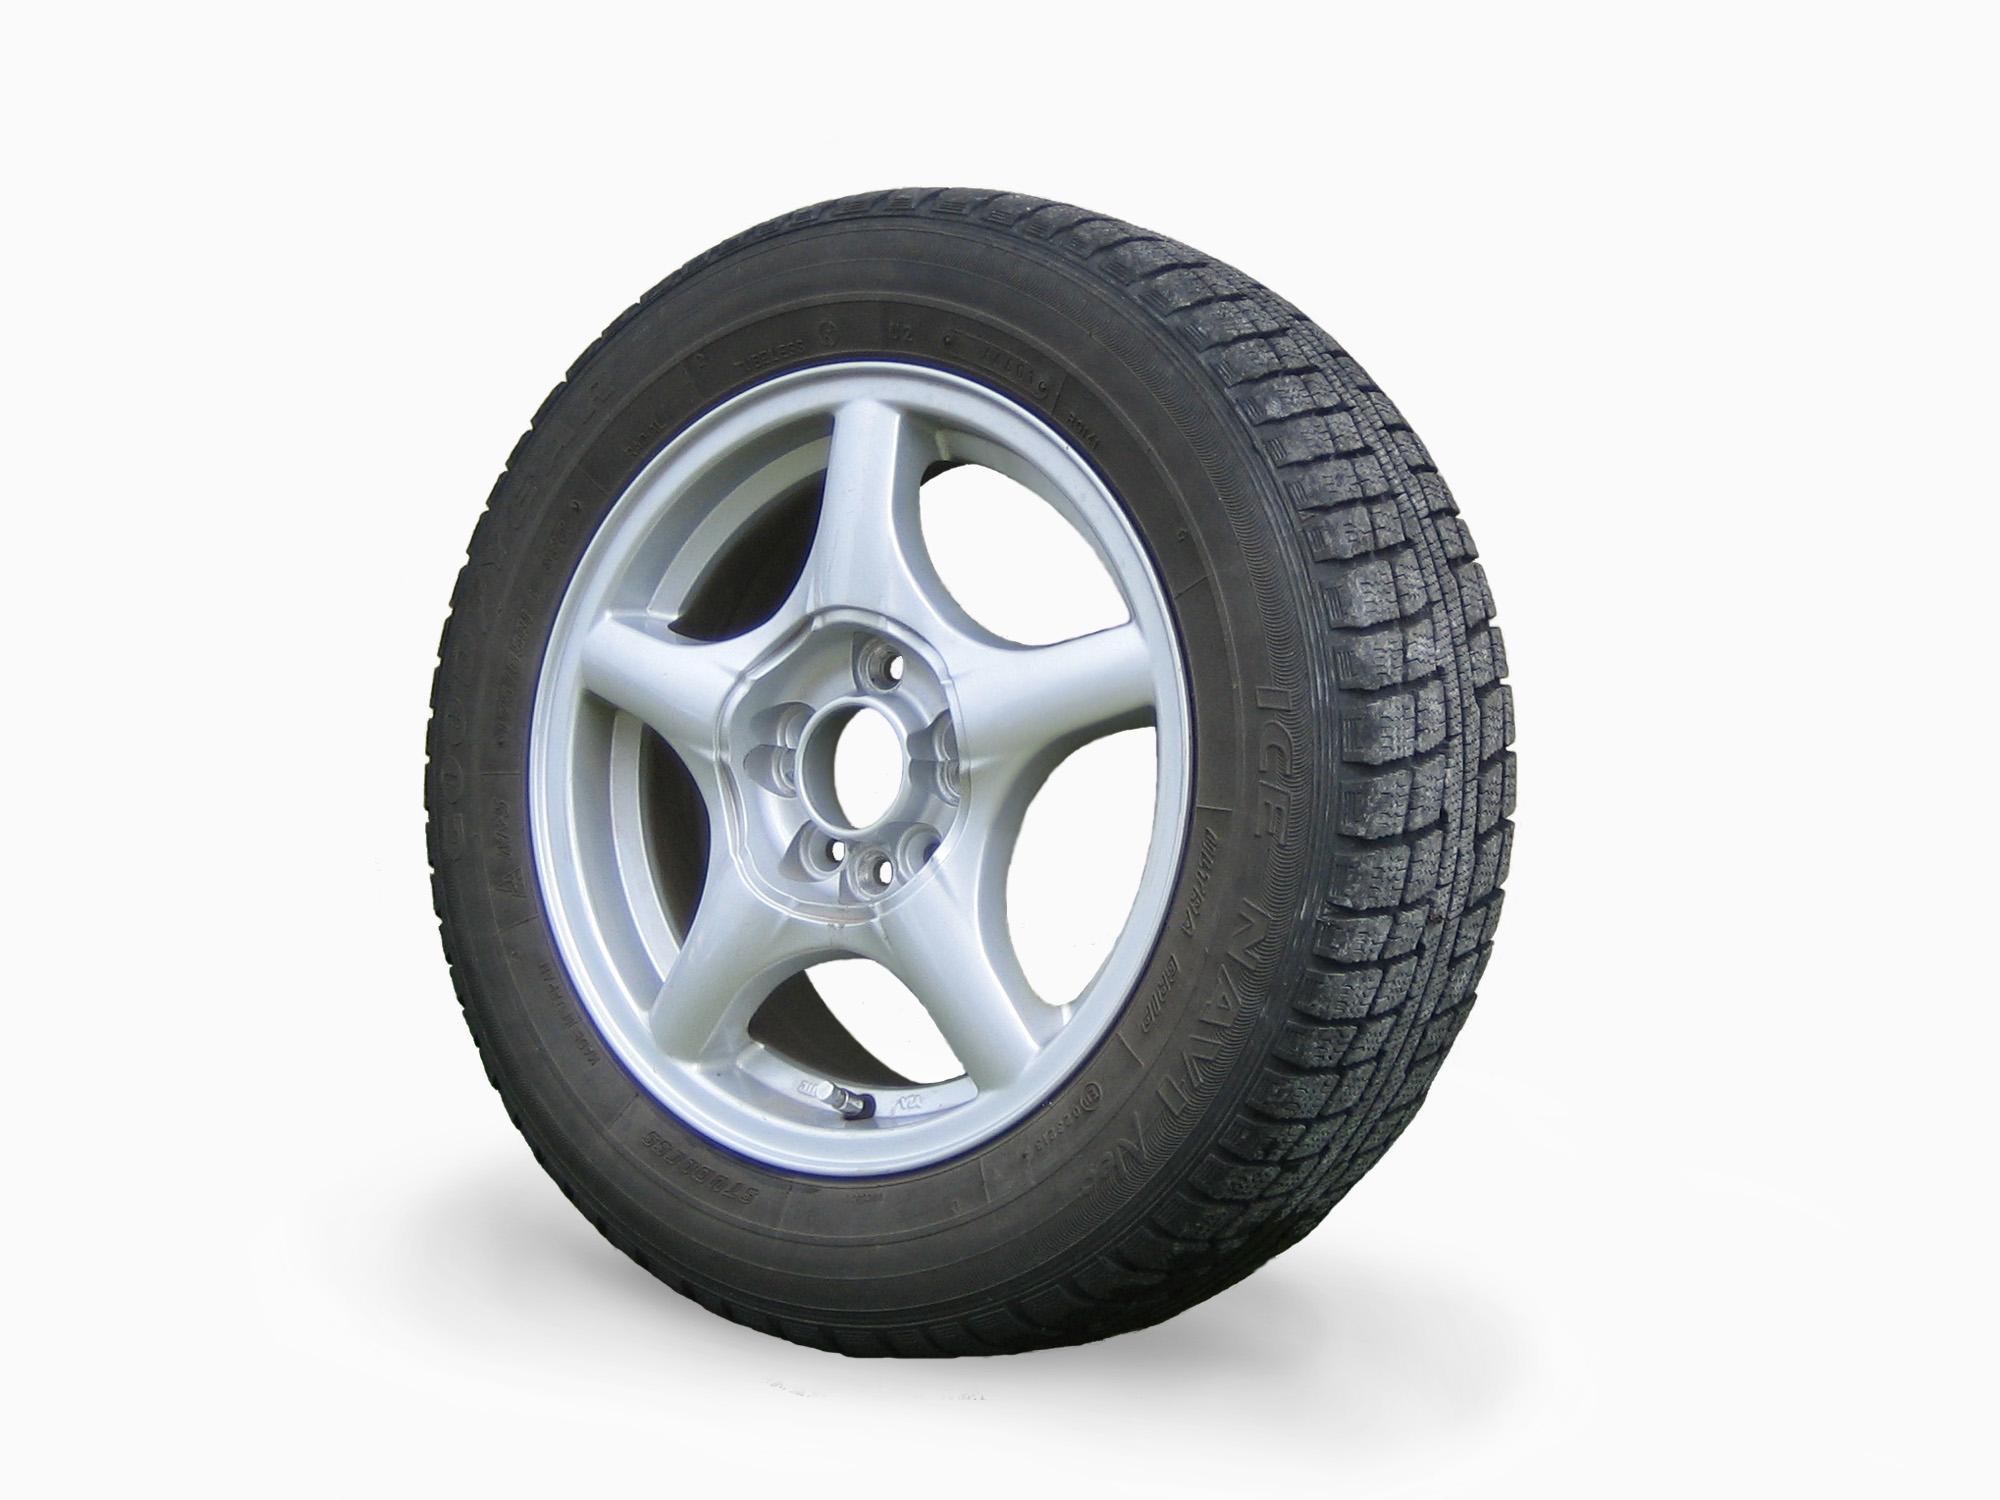 File:Studless tire 1.jpg - Wikimedia Commons